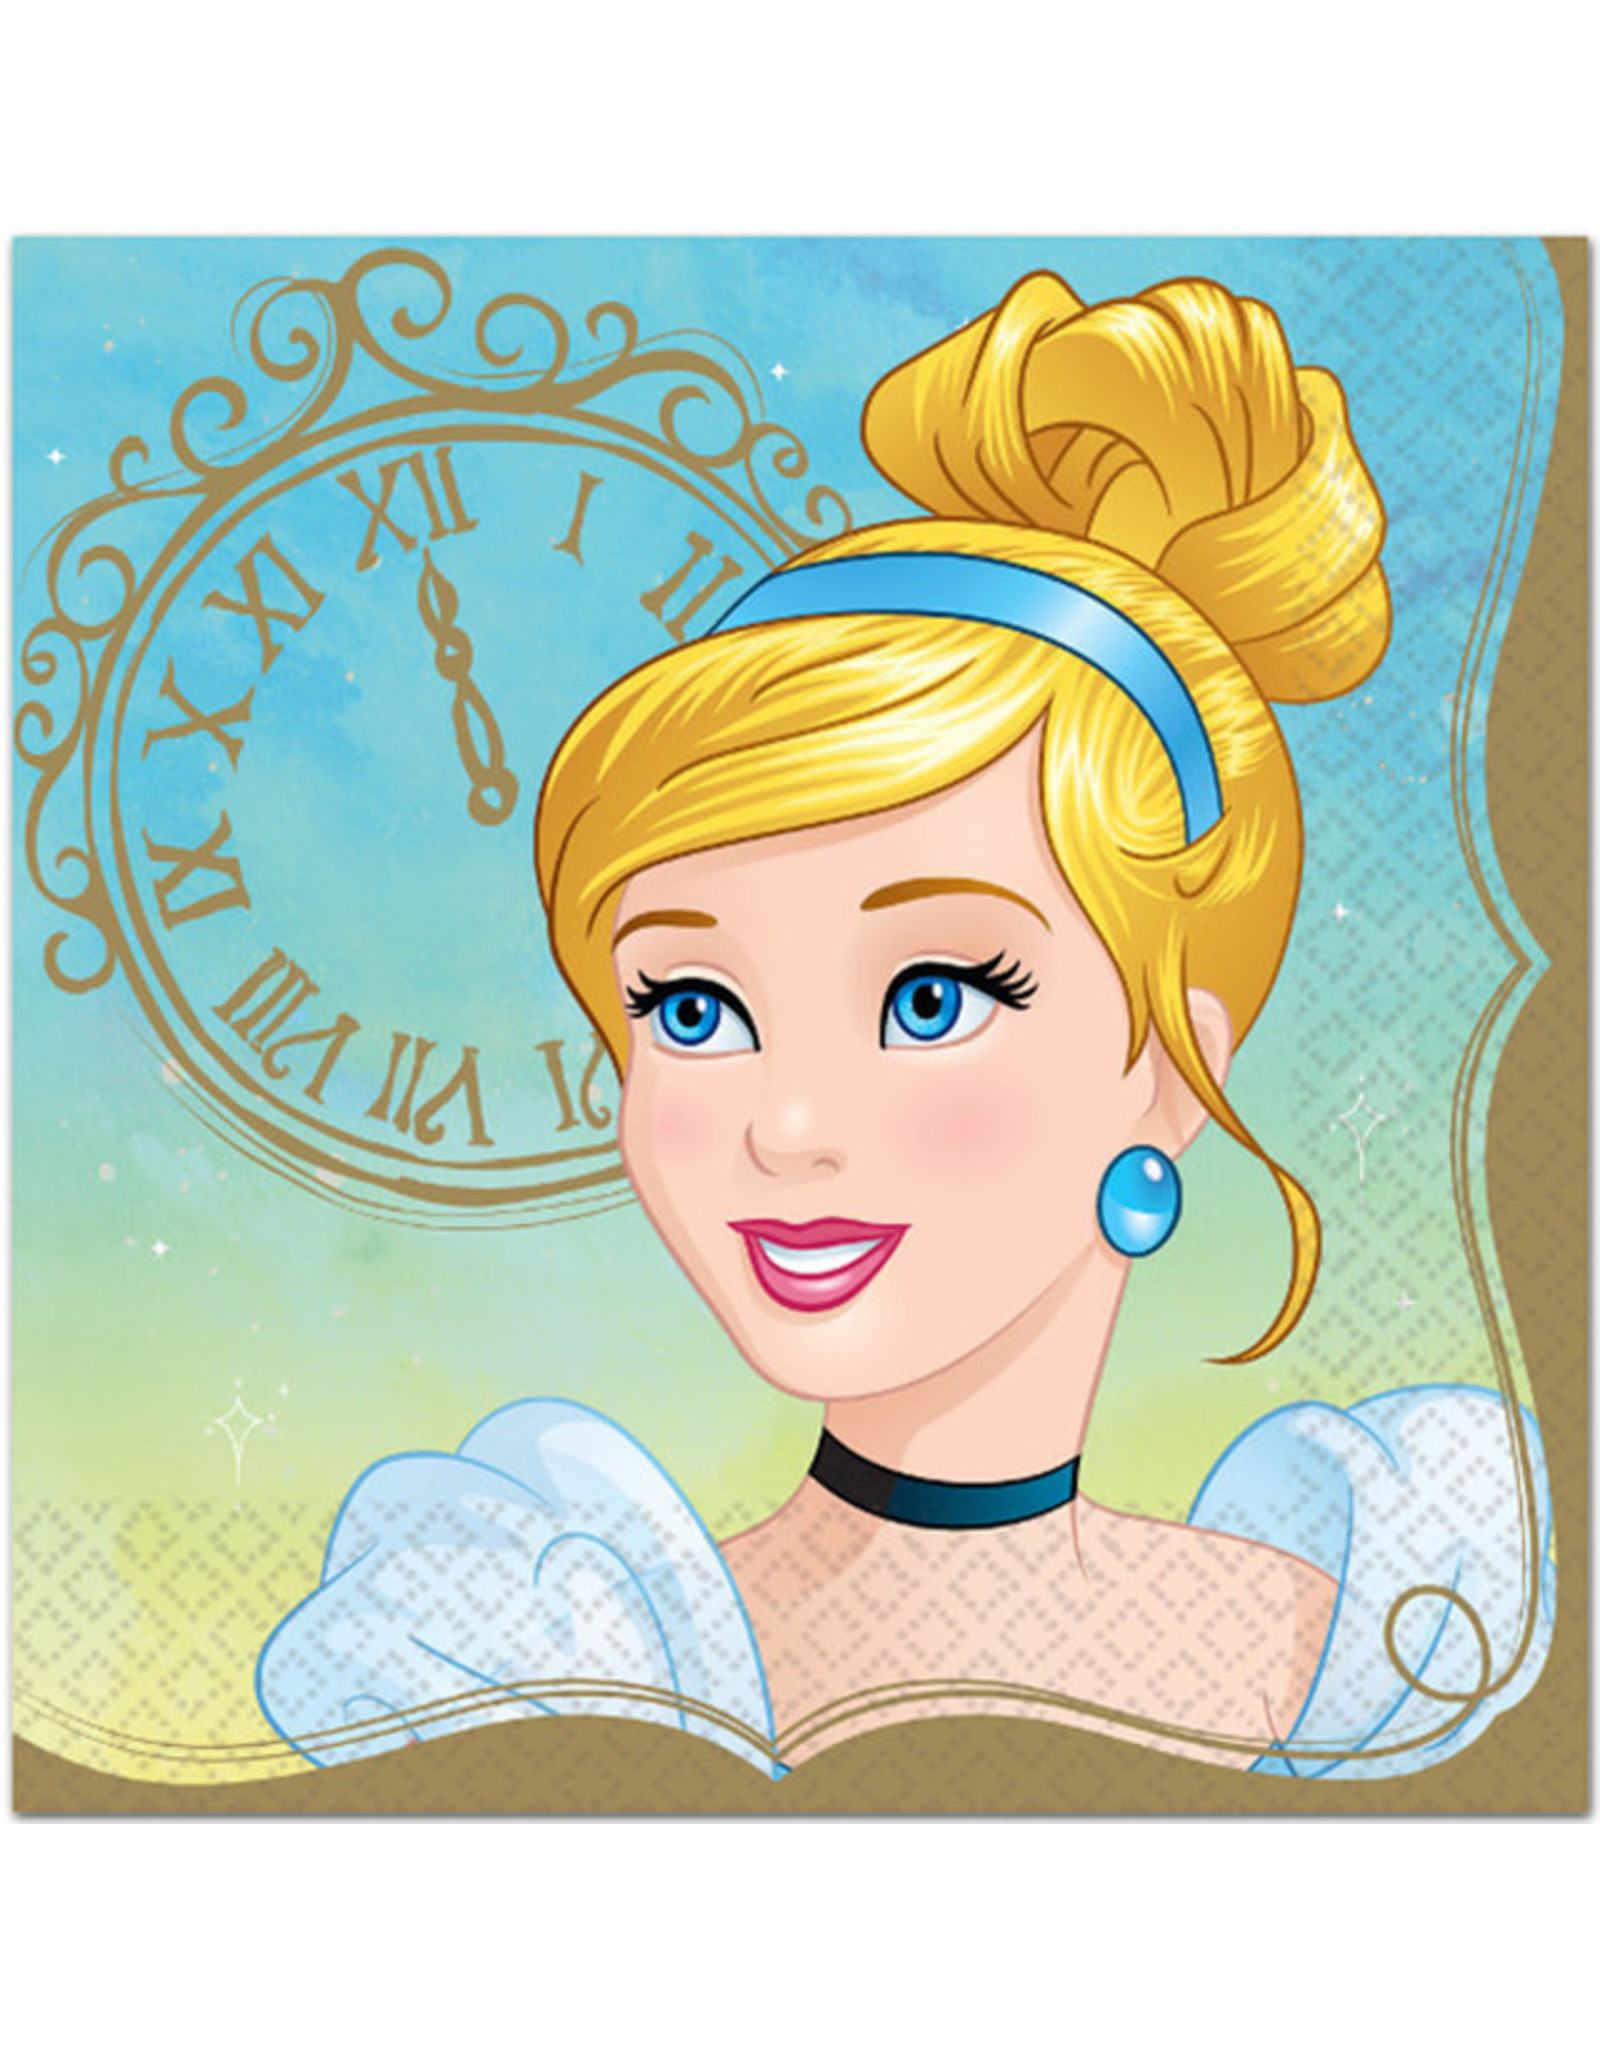 Disney Princess Cinderella Lunch Napkins - 16ct